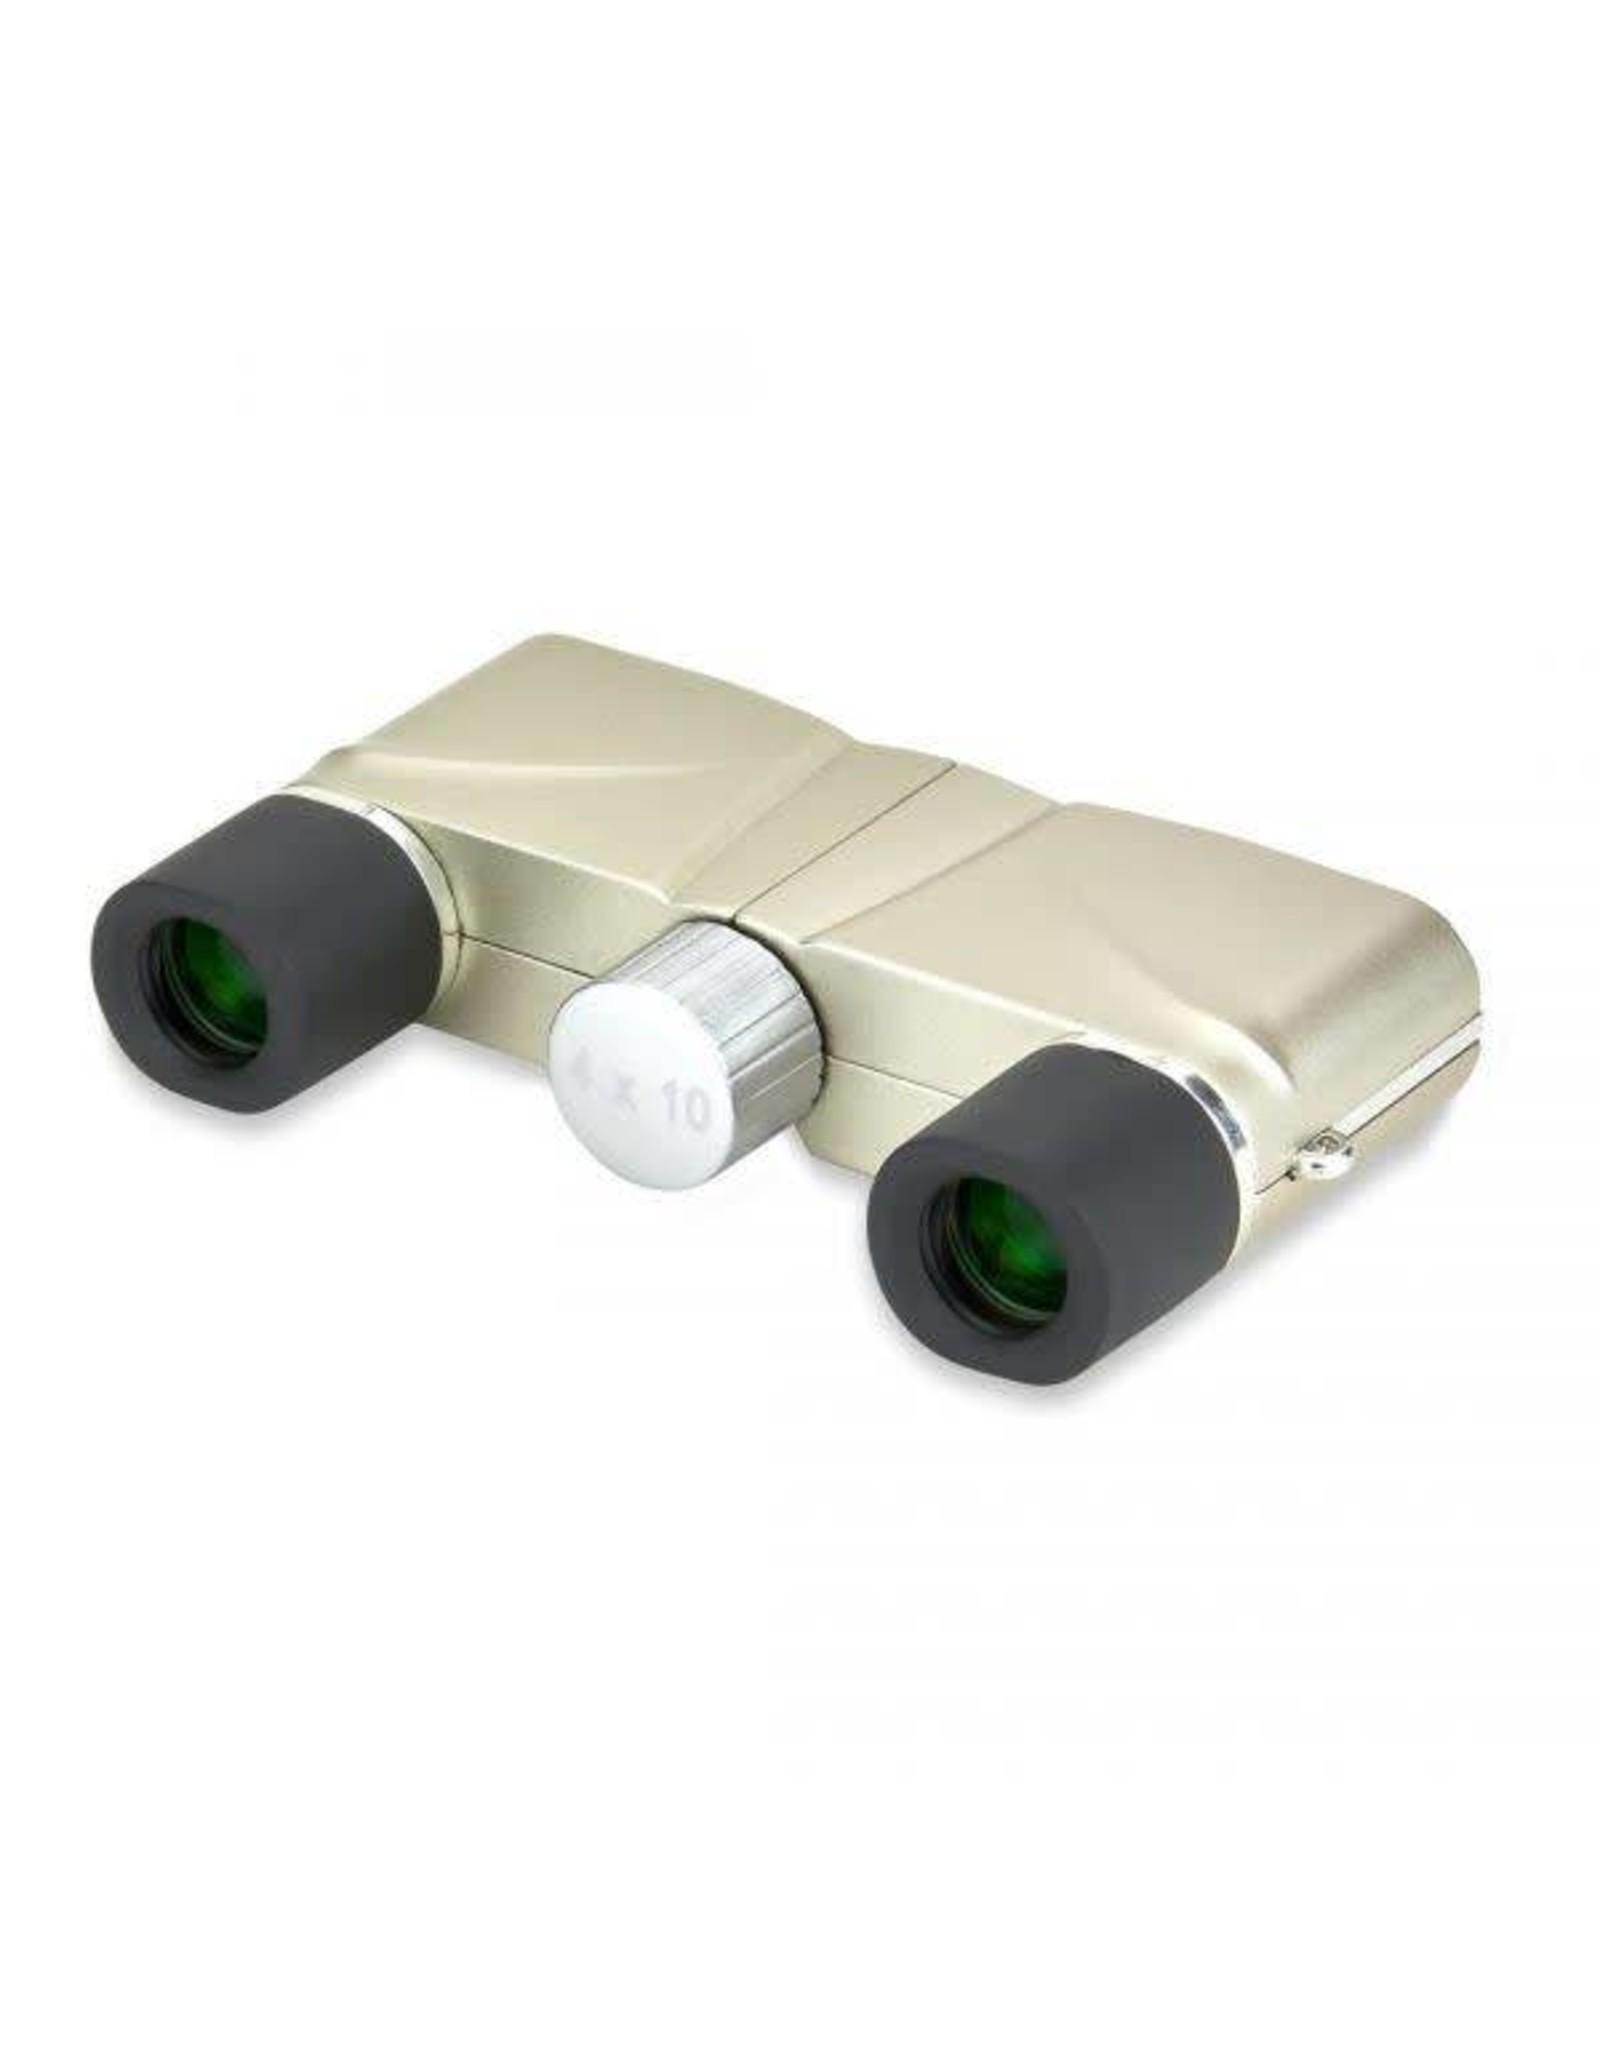 Carson Carson 4x10 Operaview Binocular